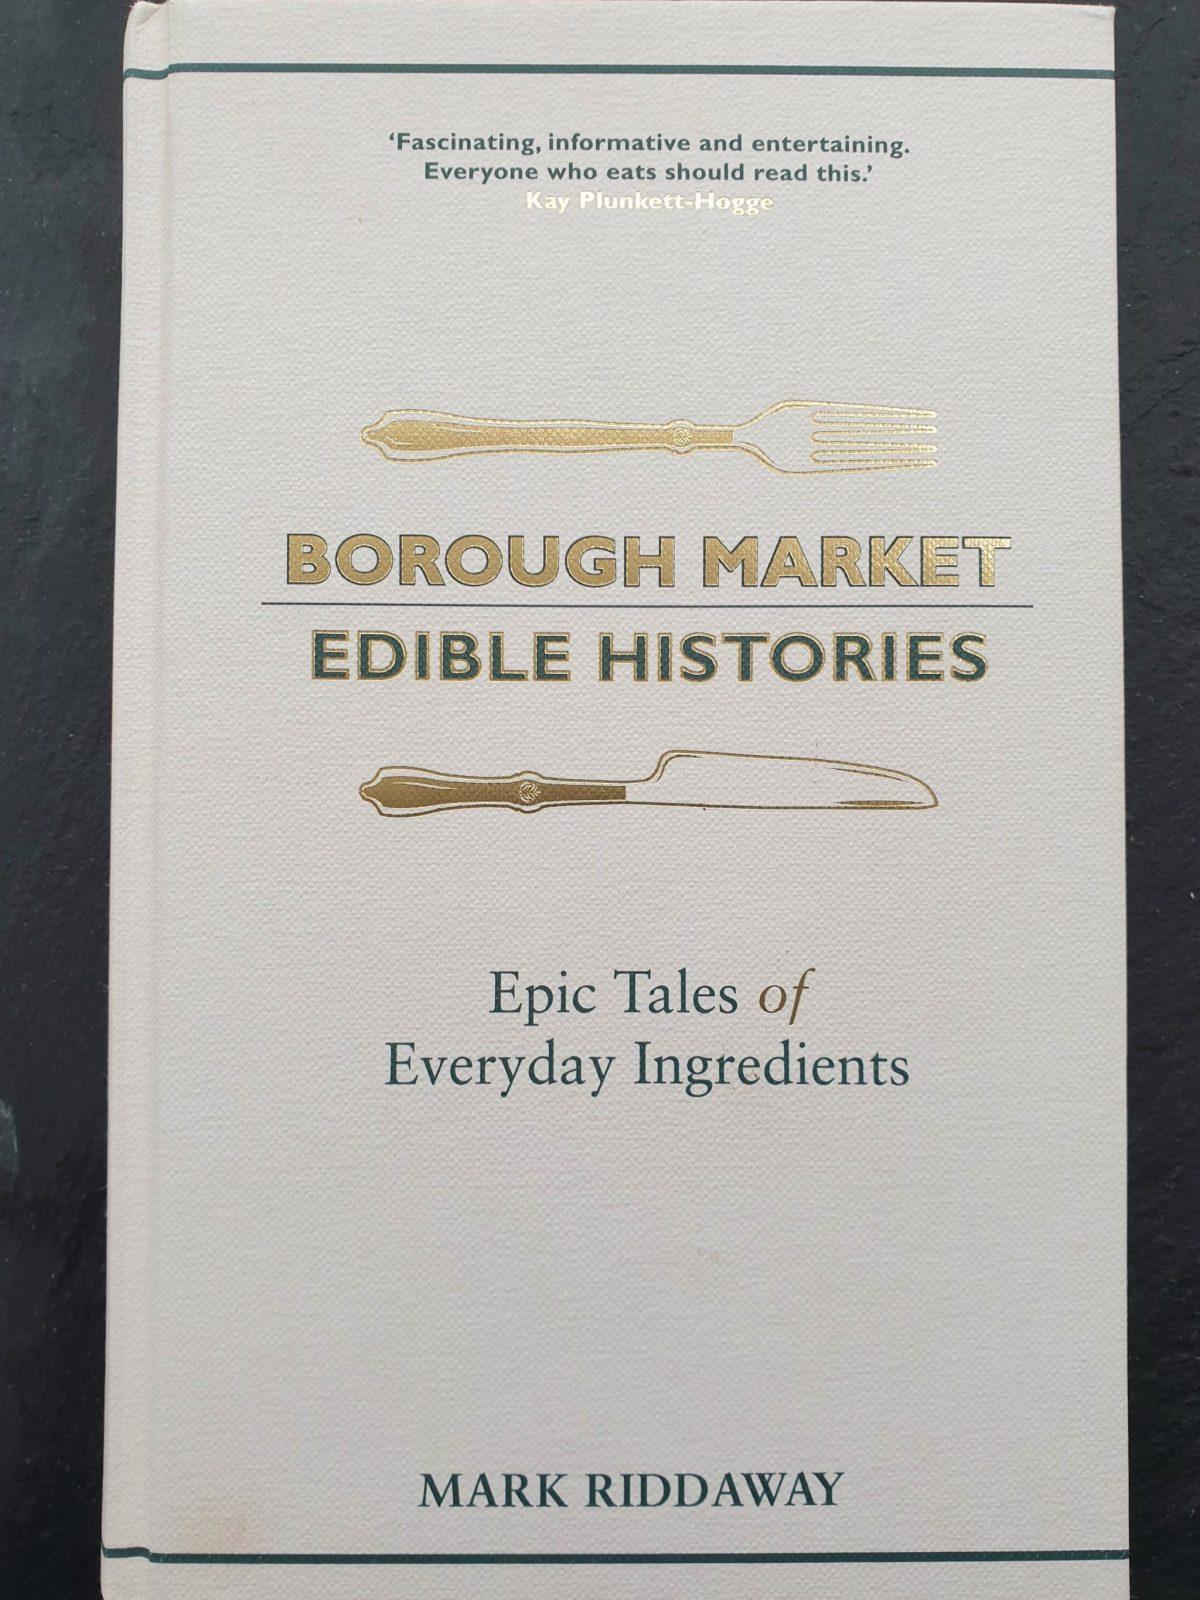 Borough Market Edible Histories